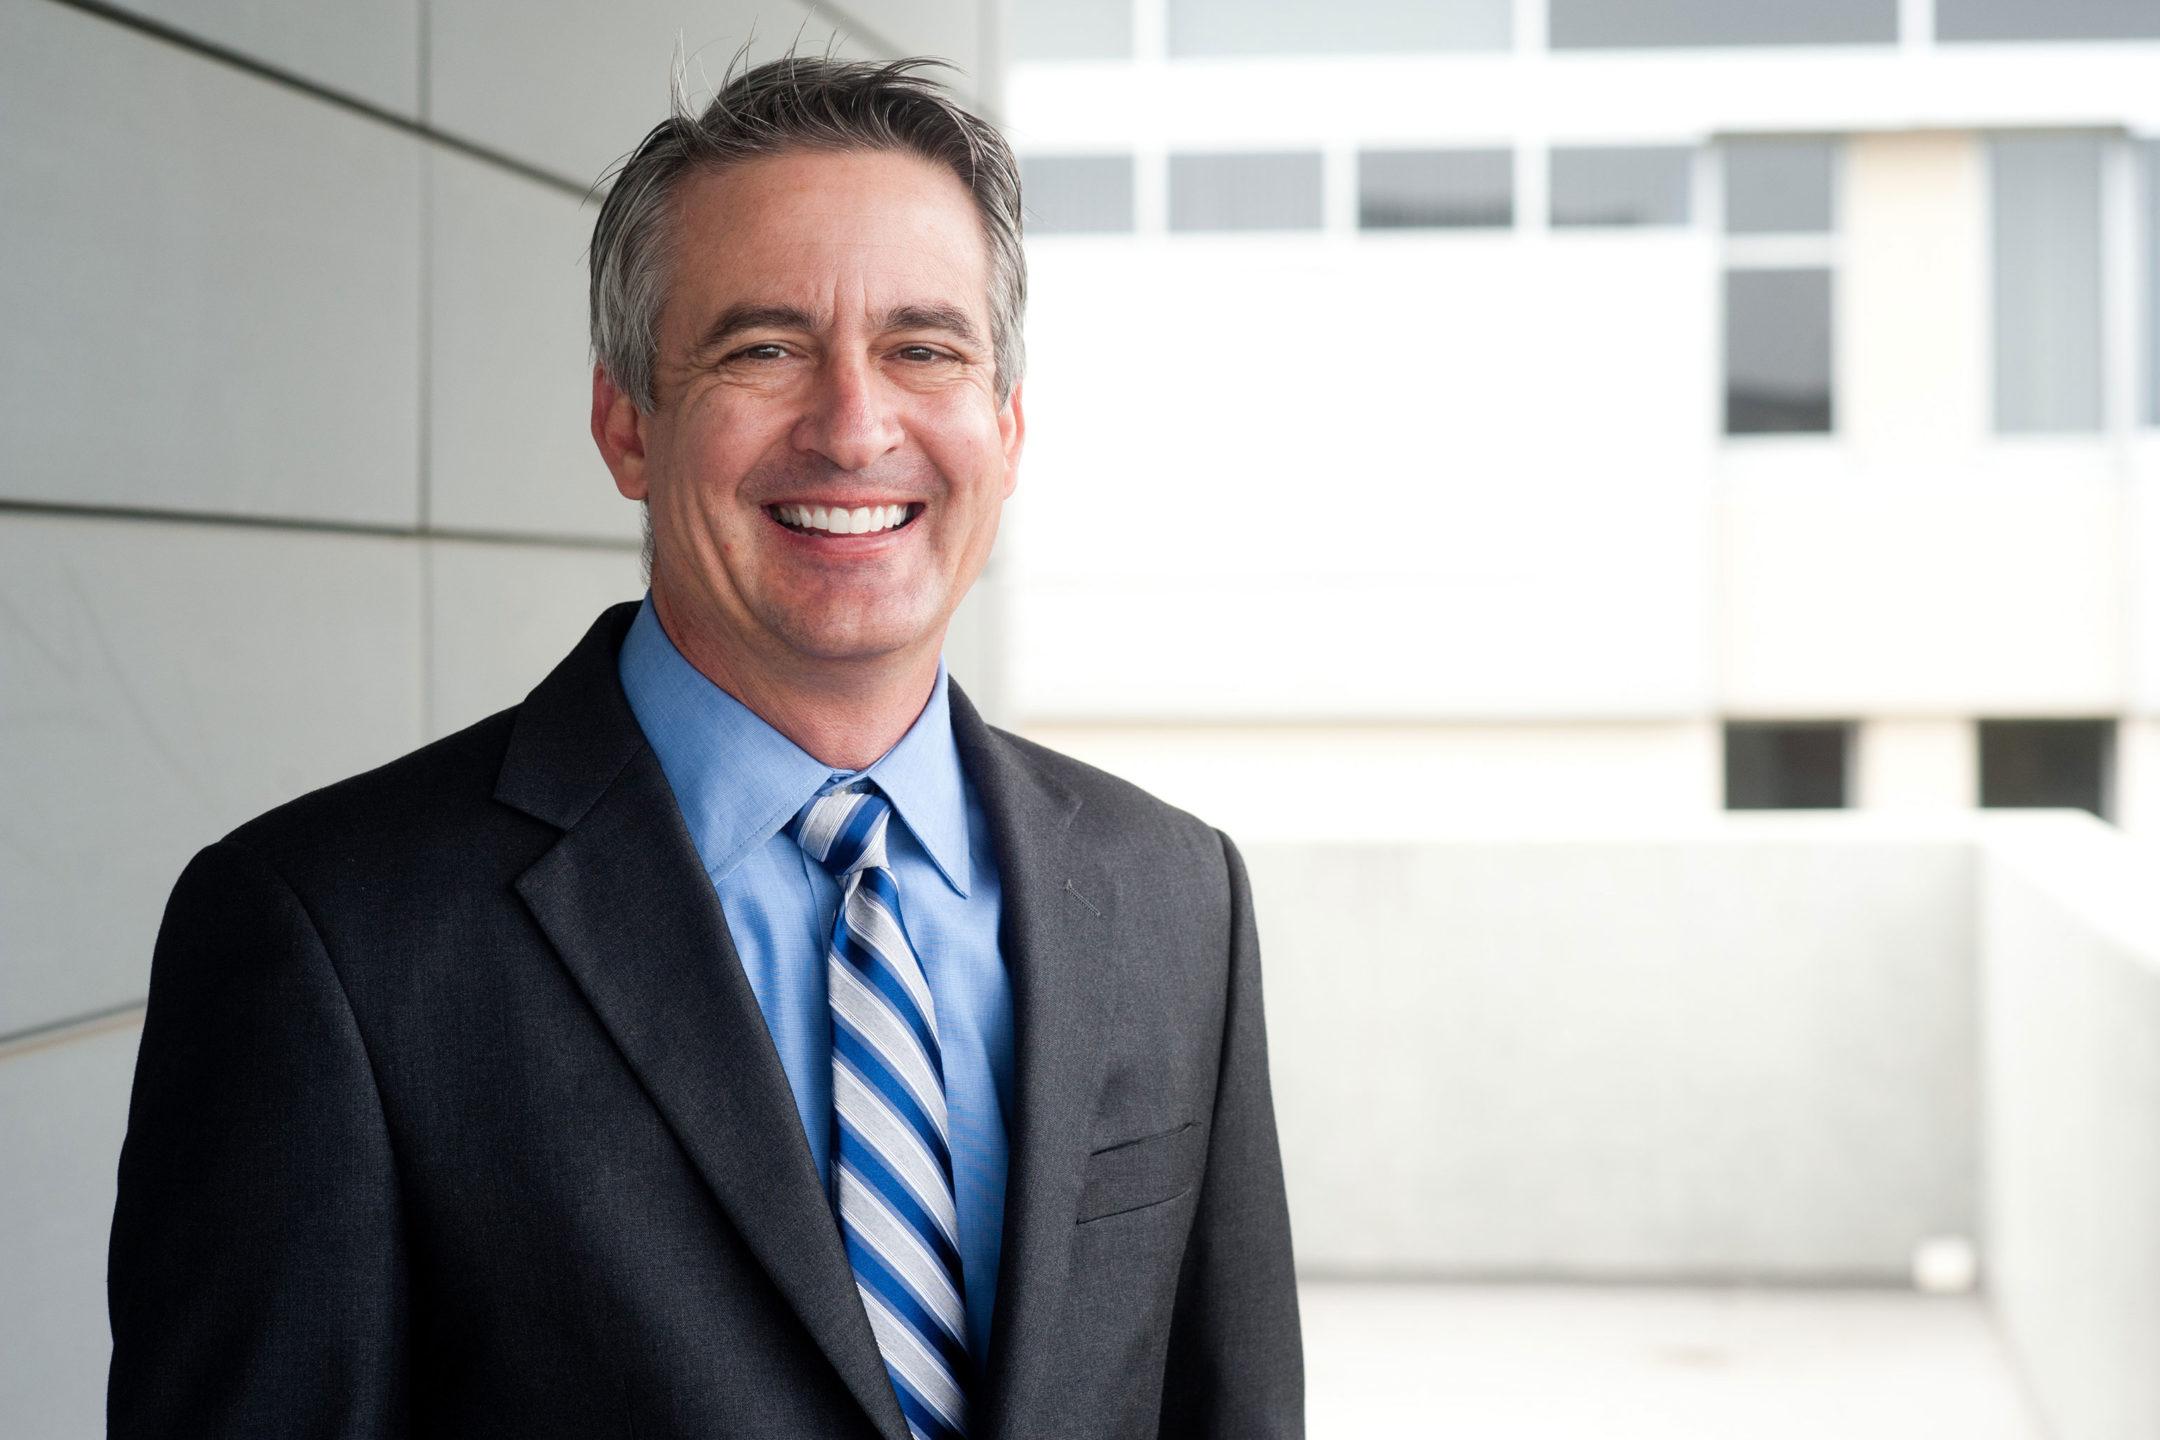 older man smiling in a suit